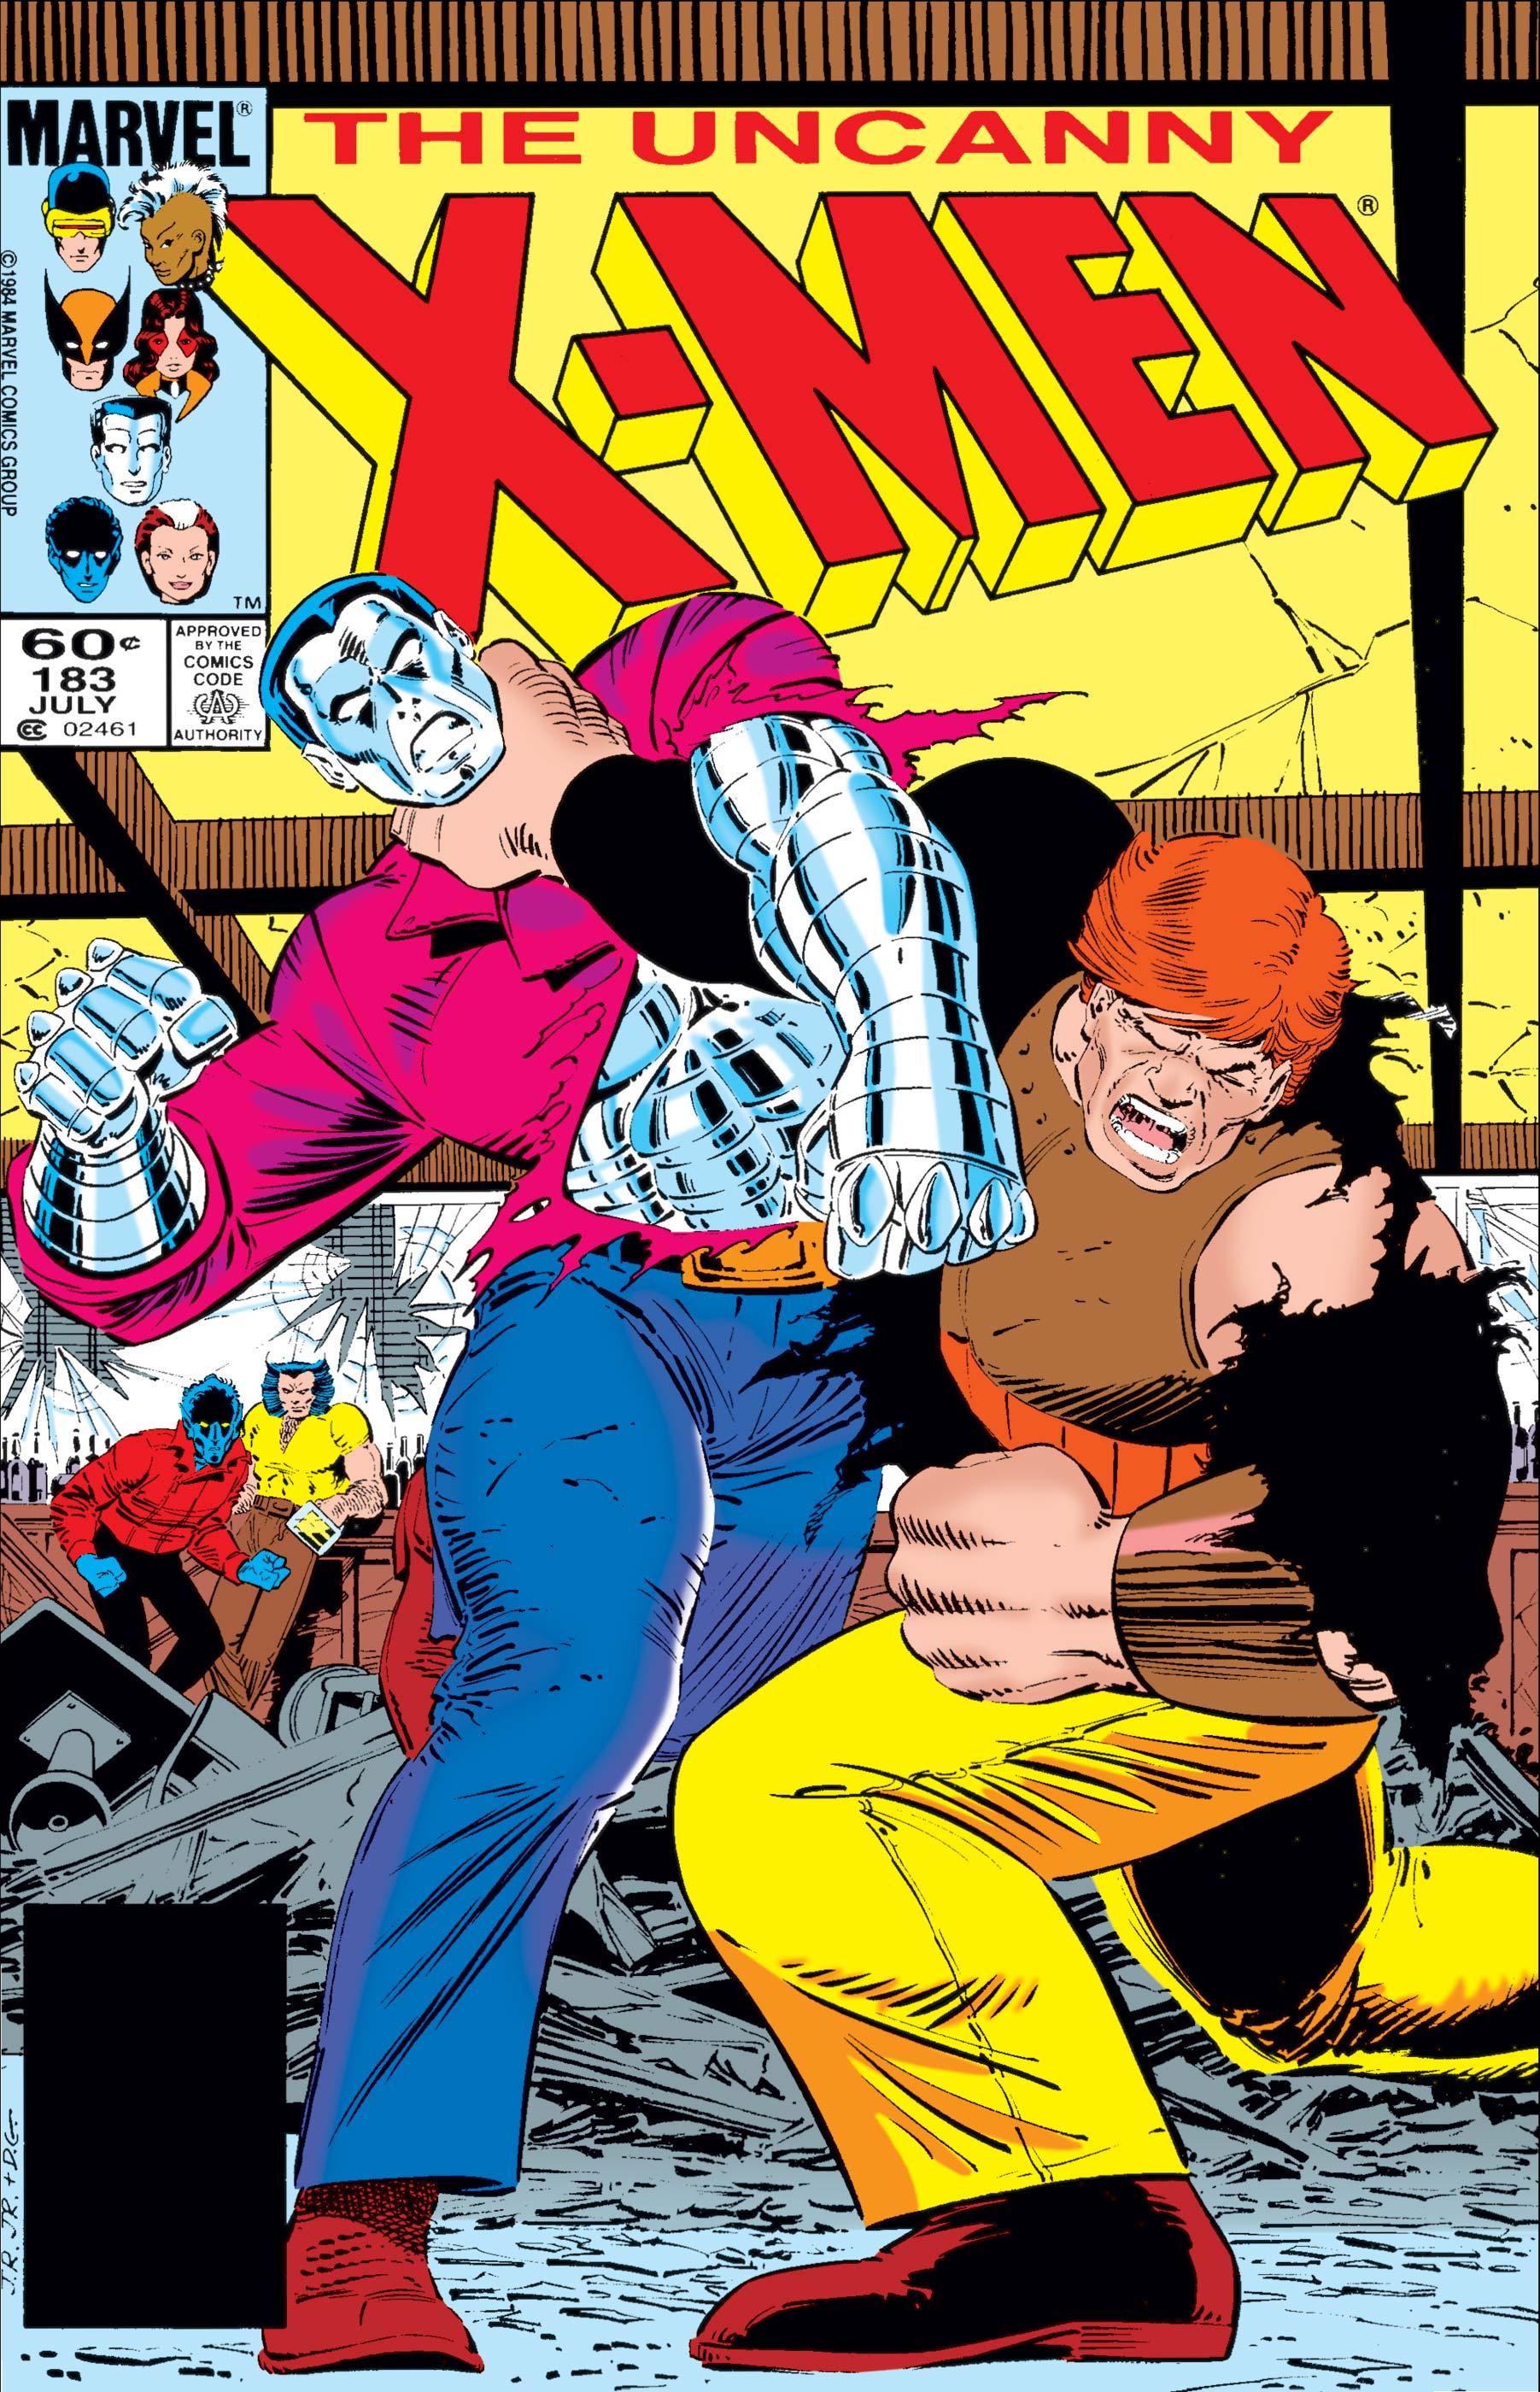 Uncanny X-Men (1963) #183